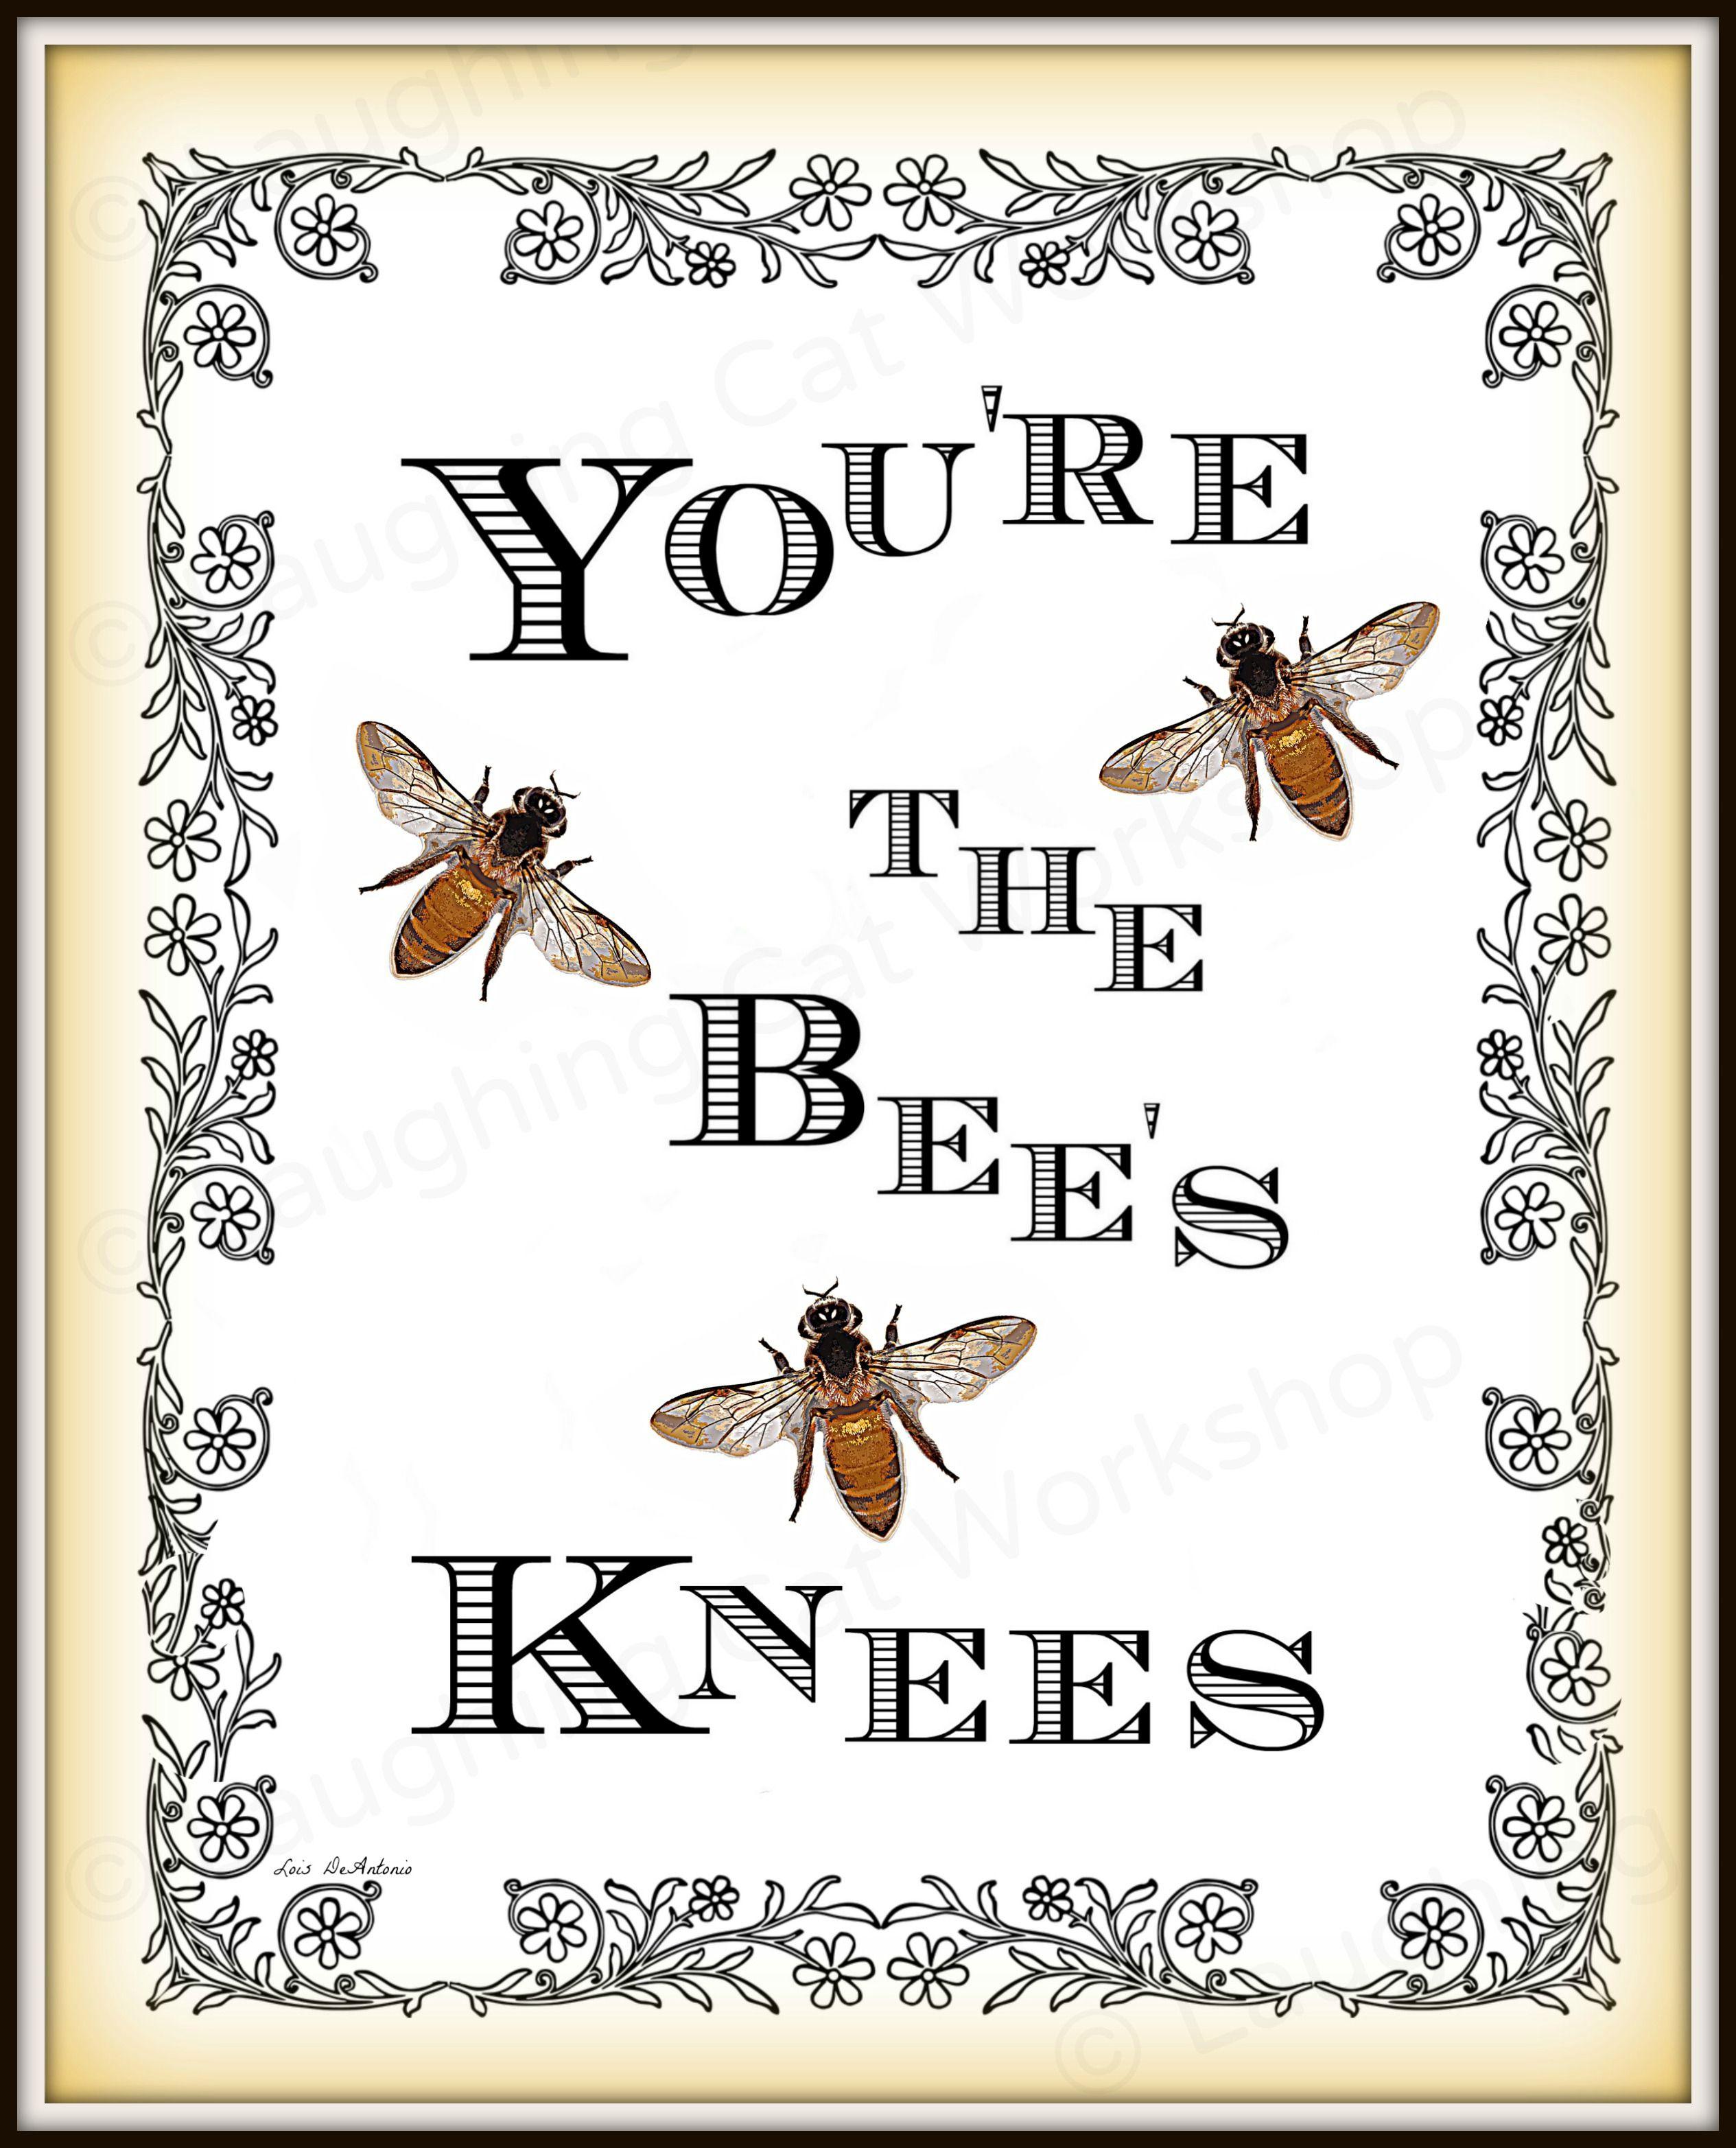 Quotes Beesknees Old School Knees Bees Antique Gardens Garden Homedecor Shabbychic Cottage Bathroomdecor Bedroomd Bee Decor Bees Knees Vintage Bee